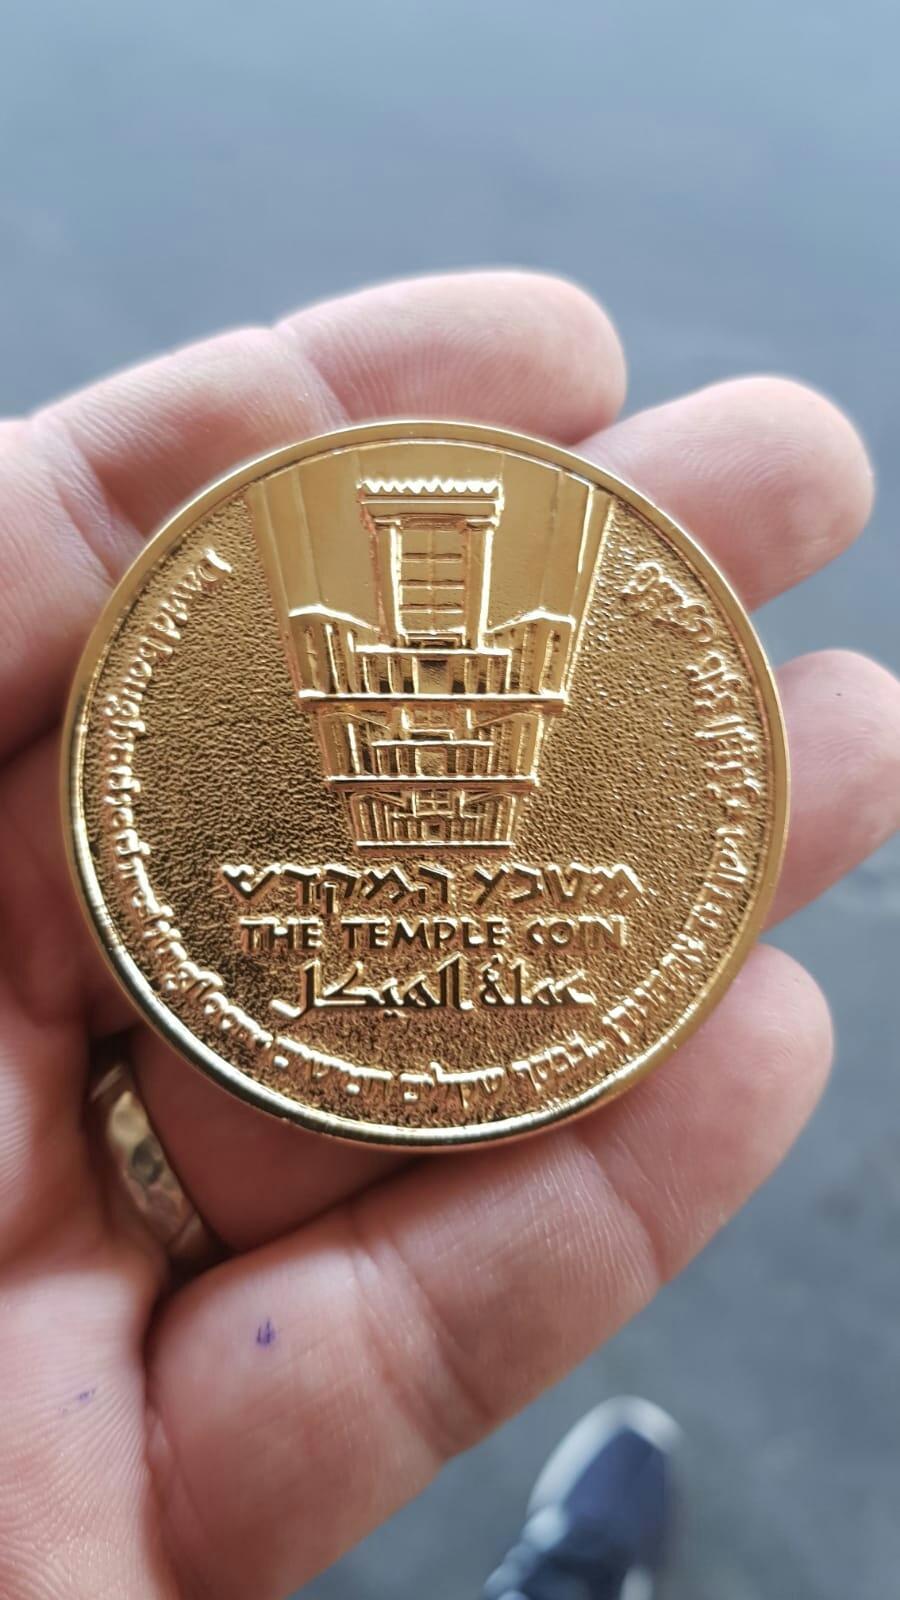 HALF SHEKEL KING DAVID COIN - gold plated